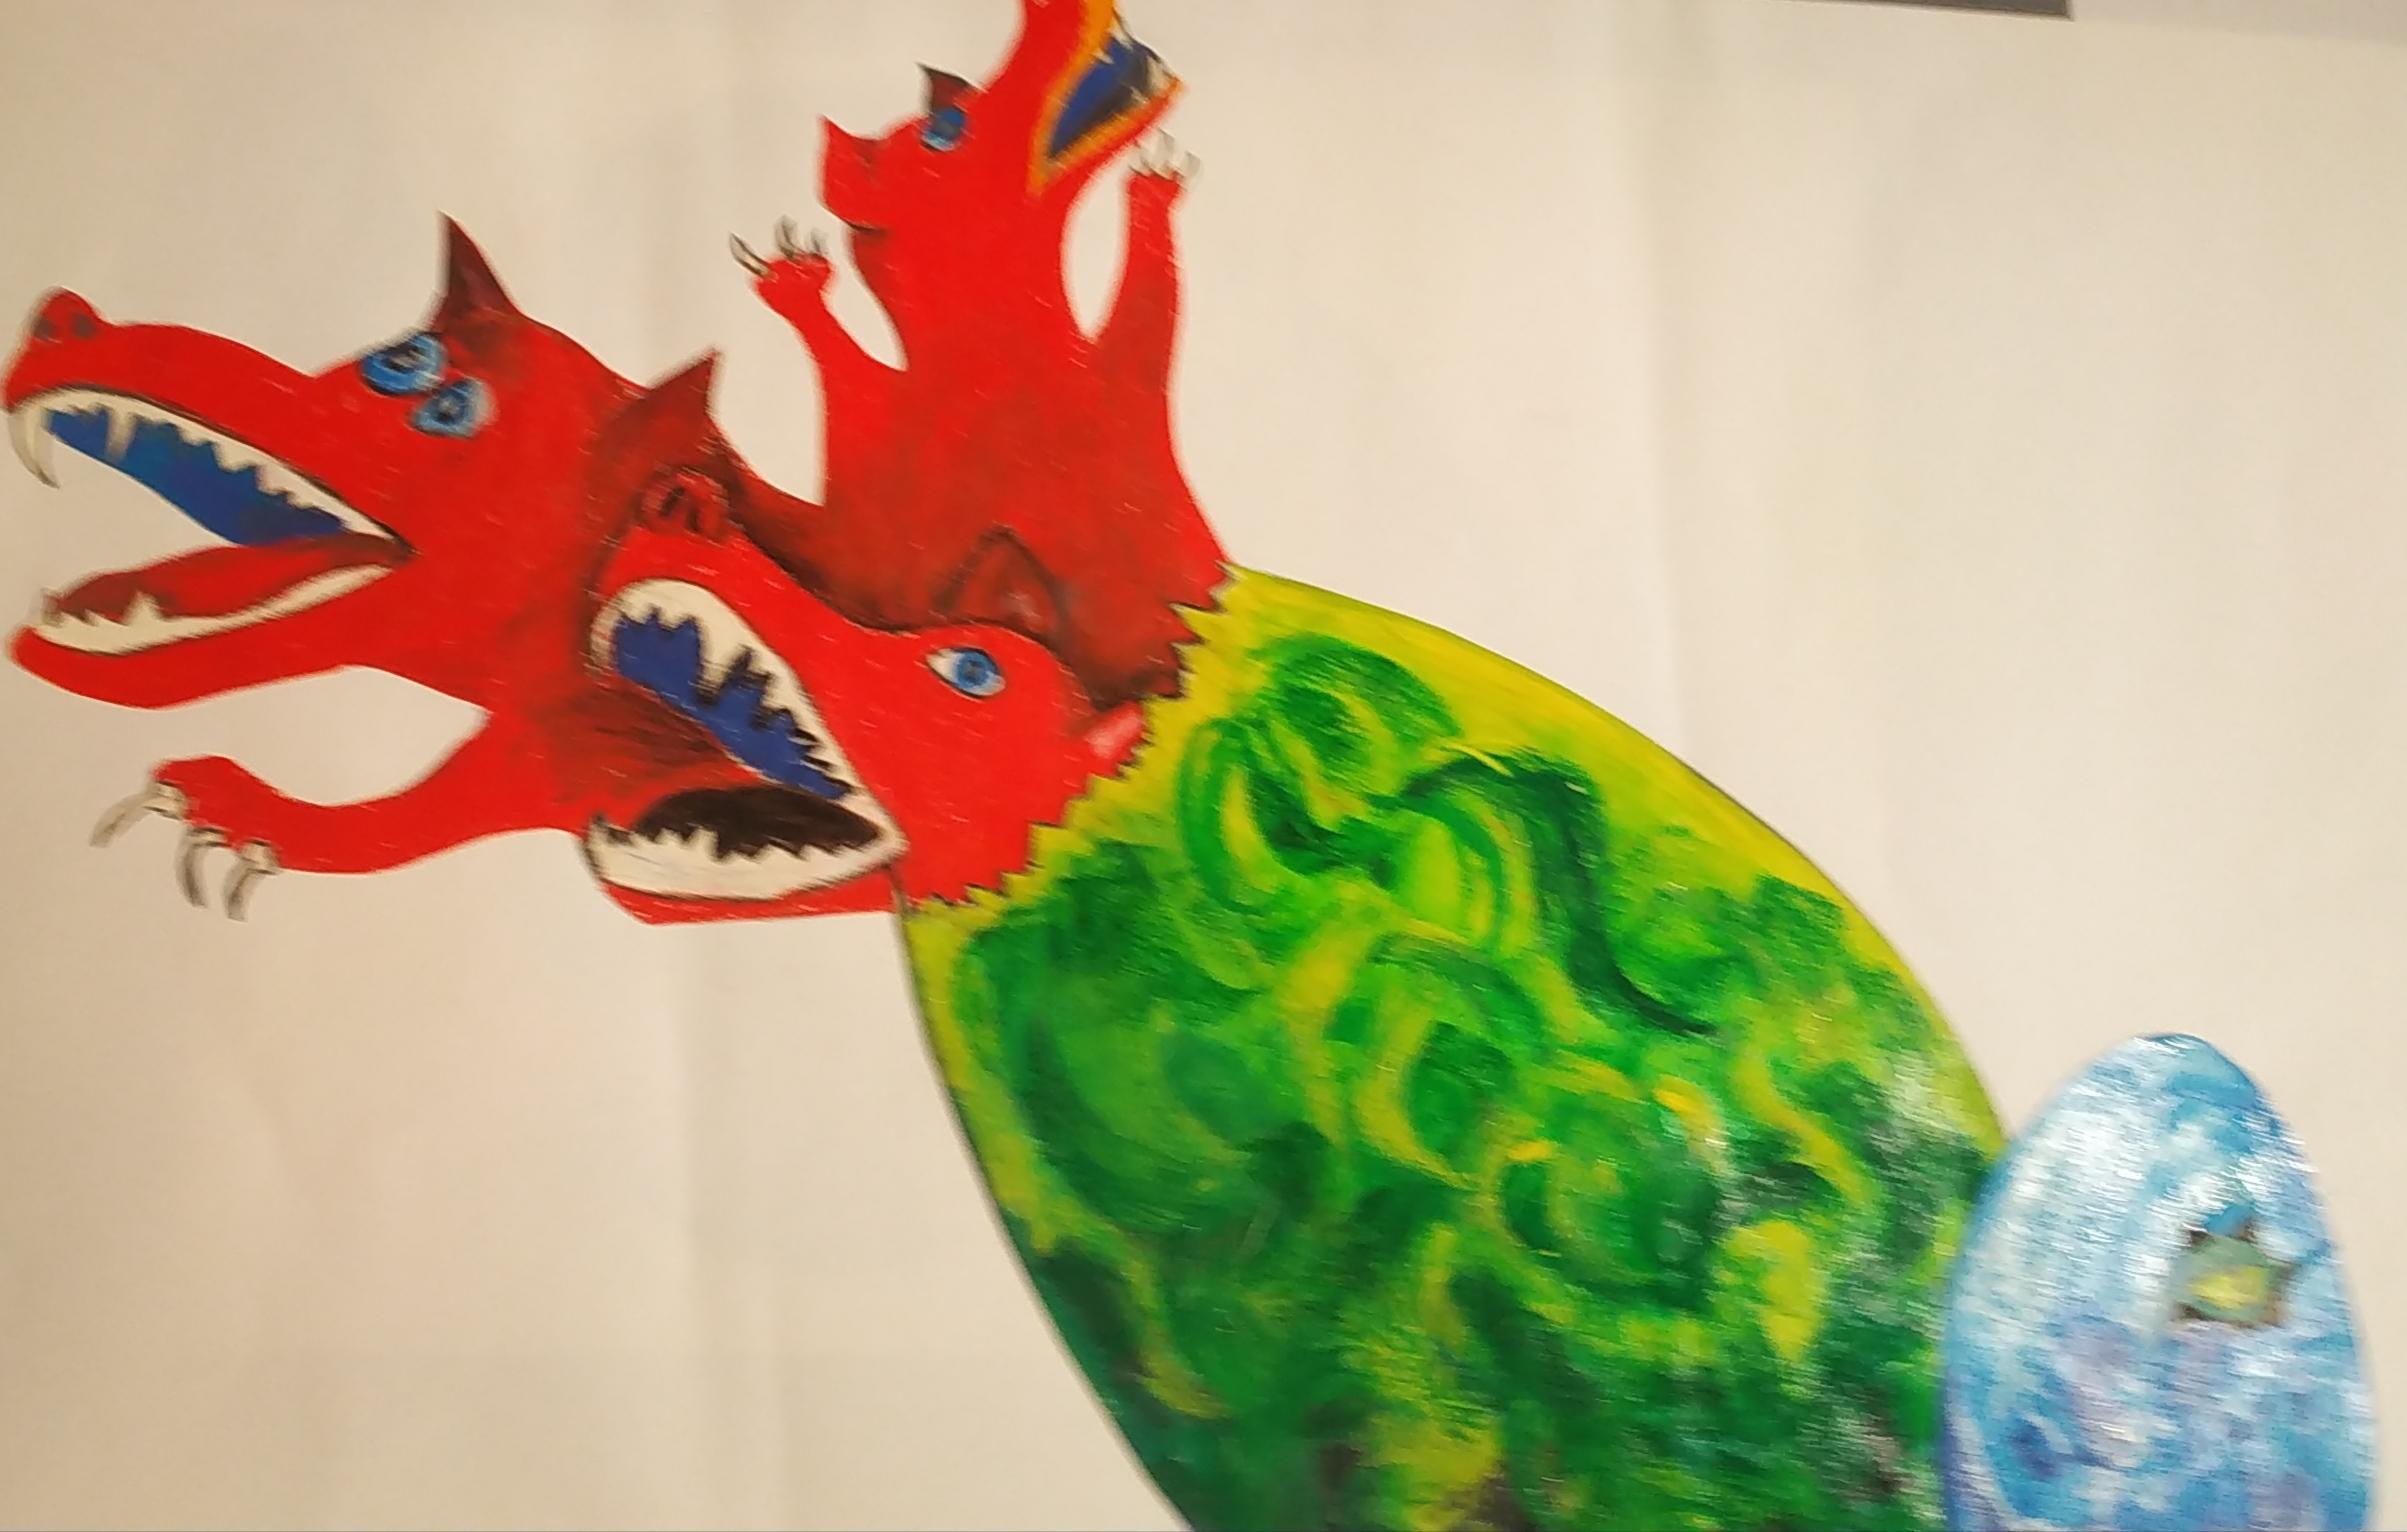 dessin oeuf de dragon vert   cours de dessin